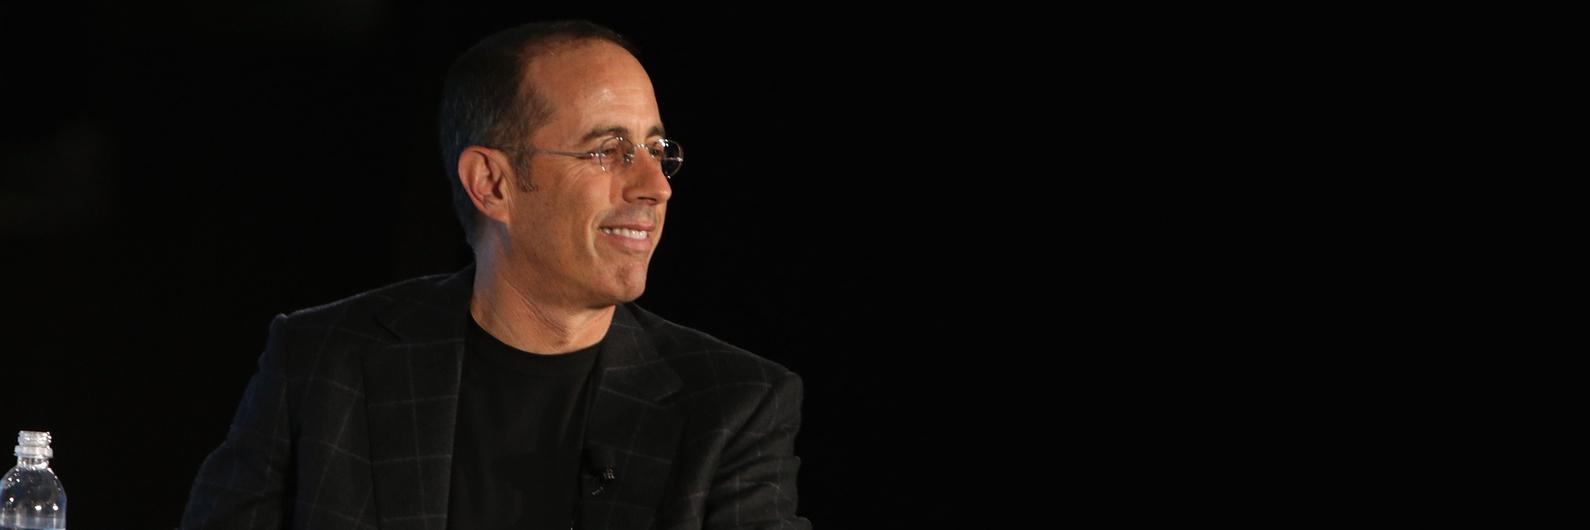 Jerry Seinfeld estreia programa na Netflix em setembro